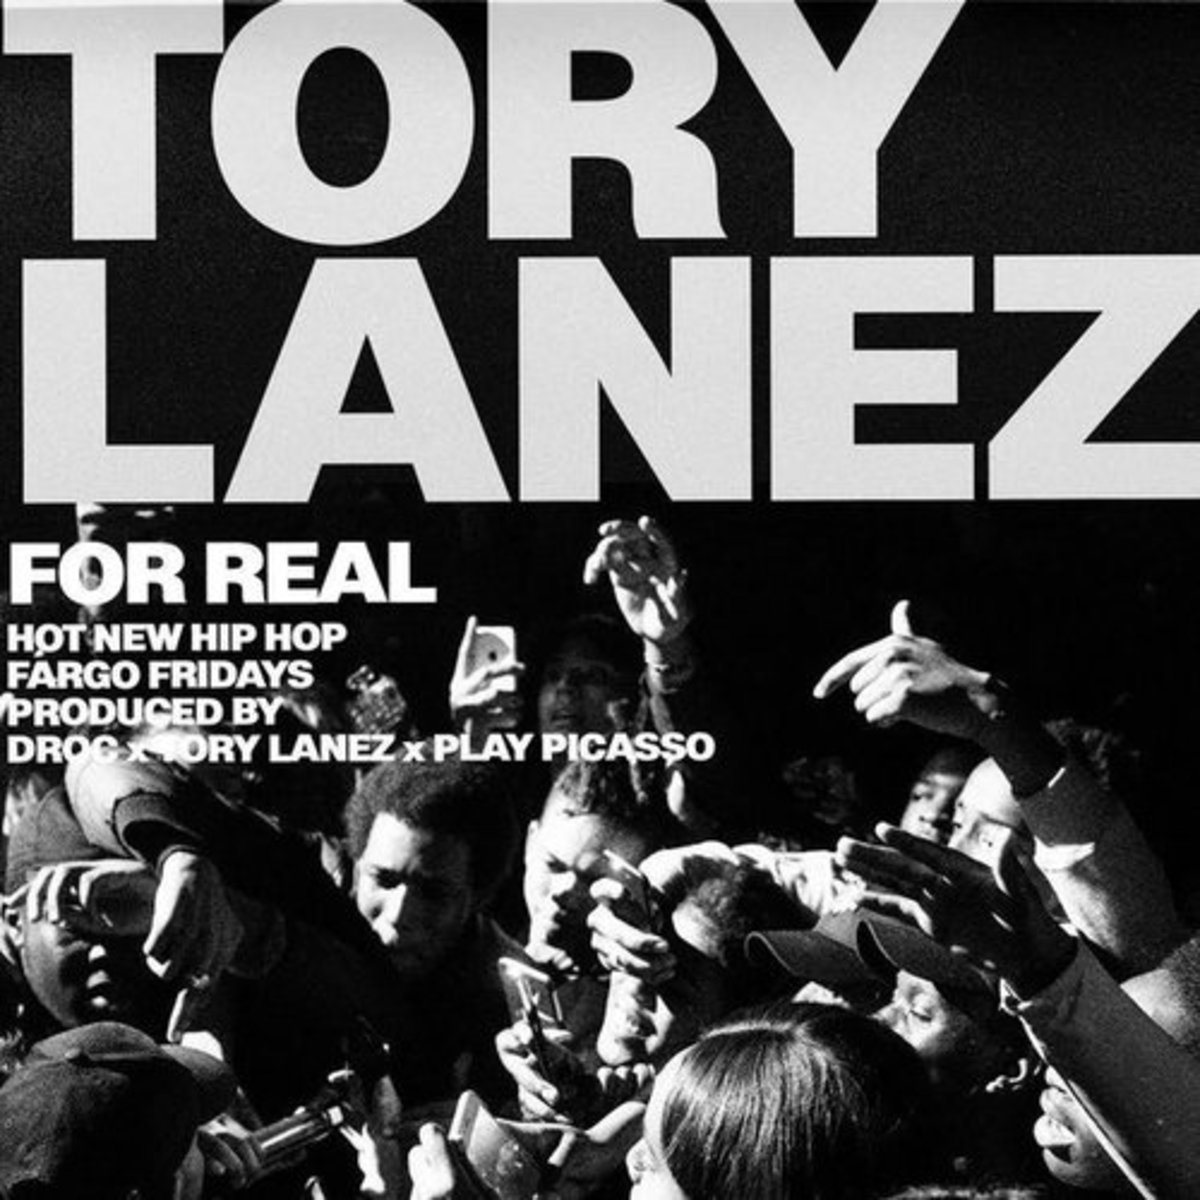 tory-lanez-for-real.jpg